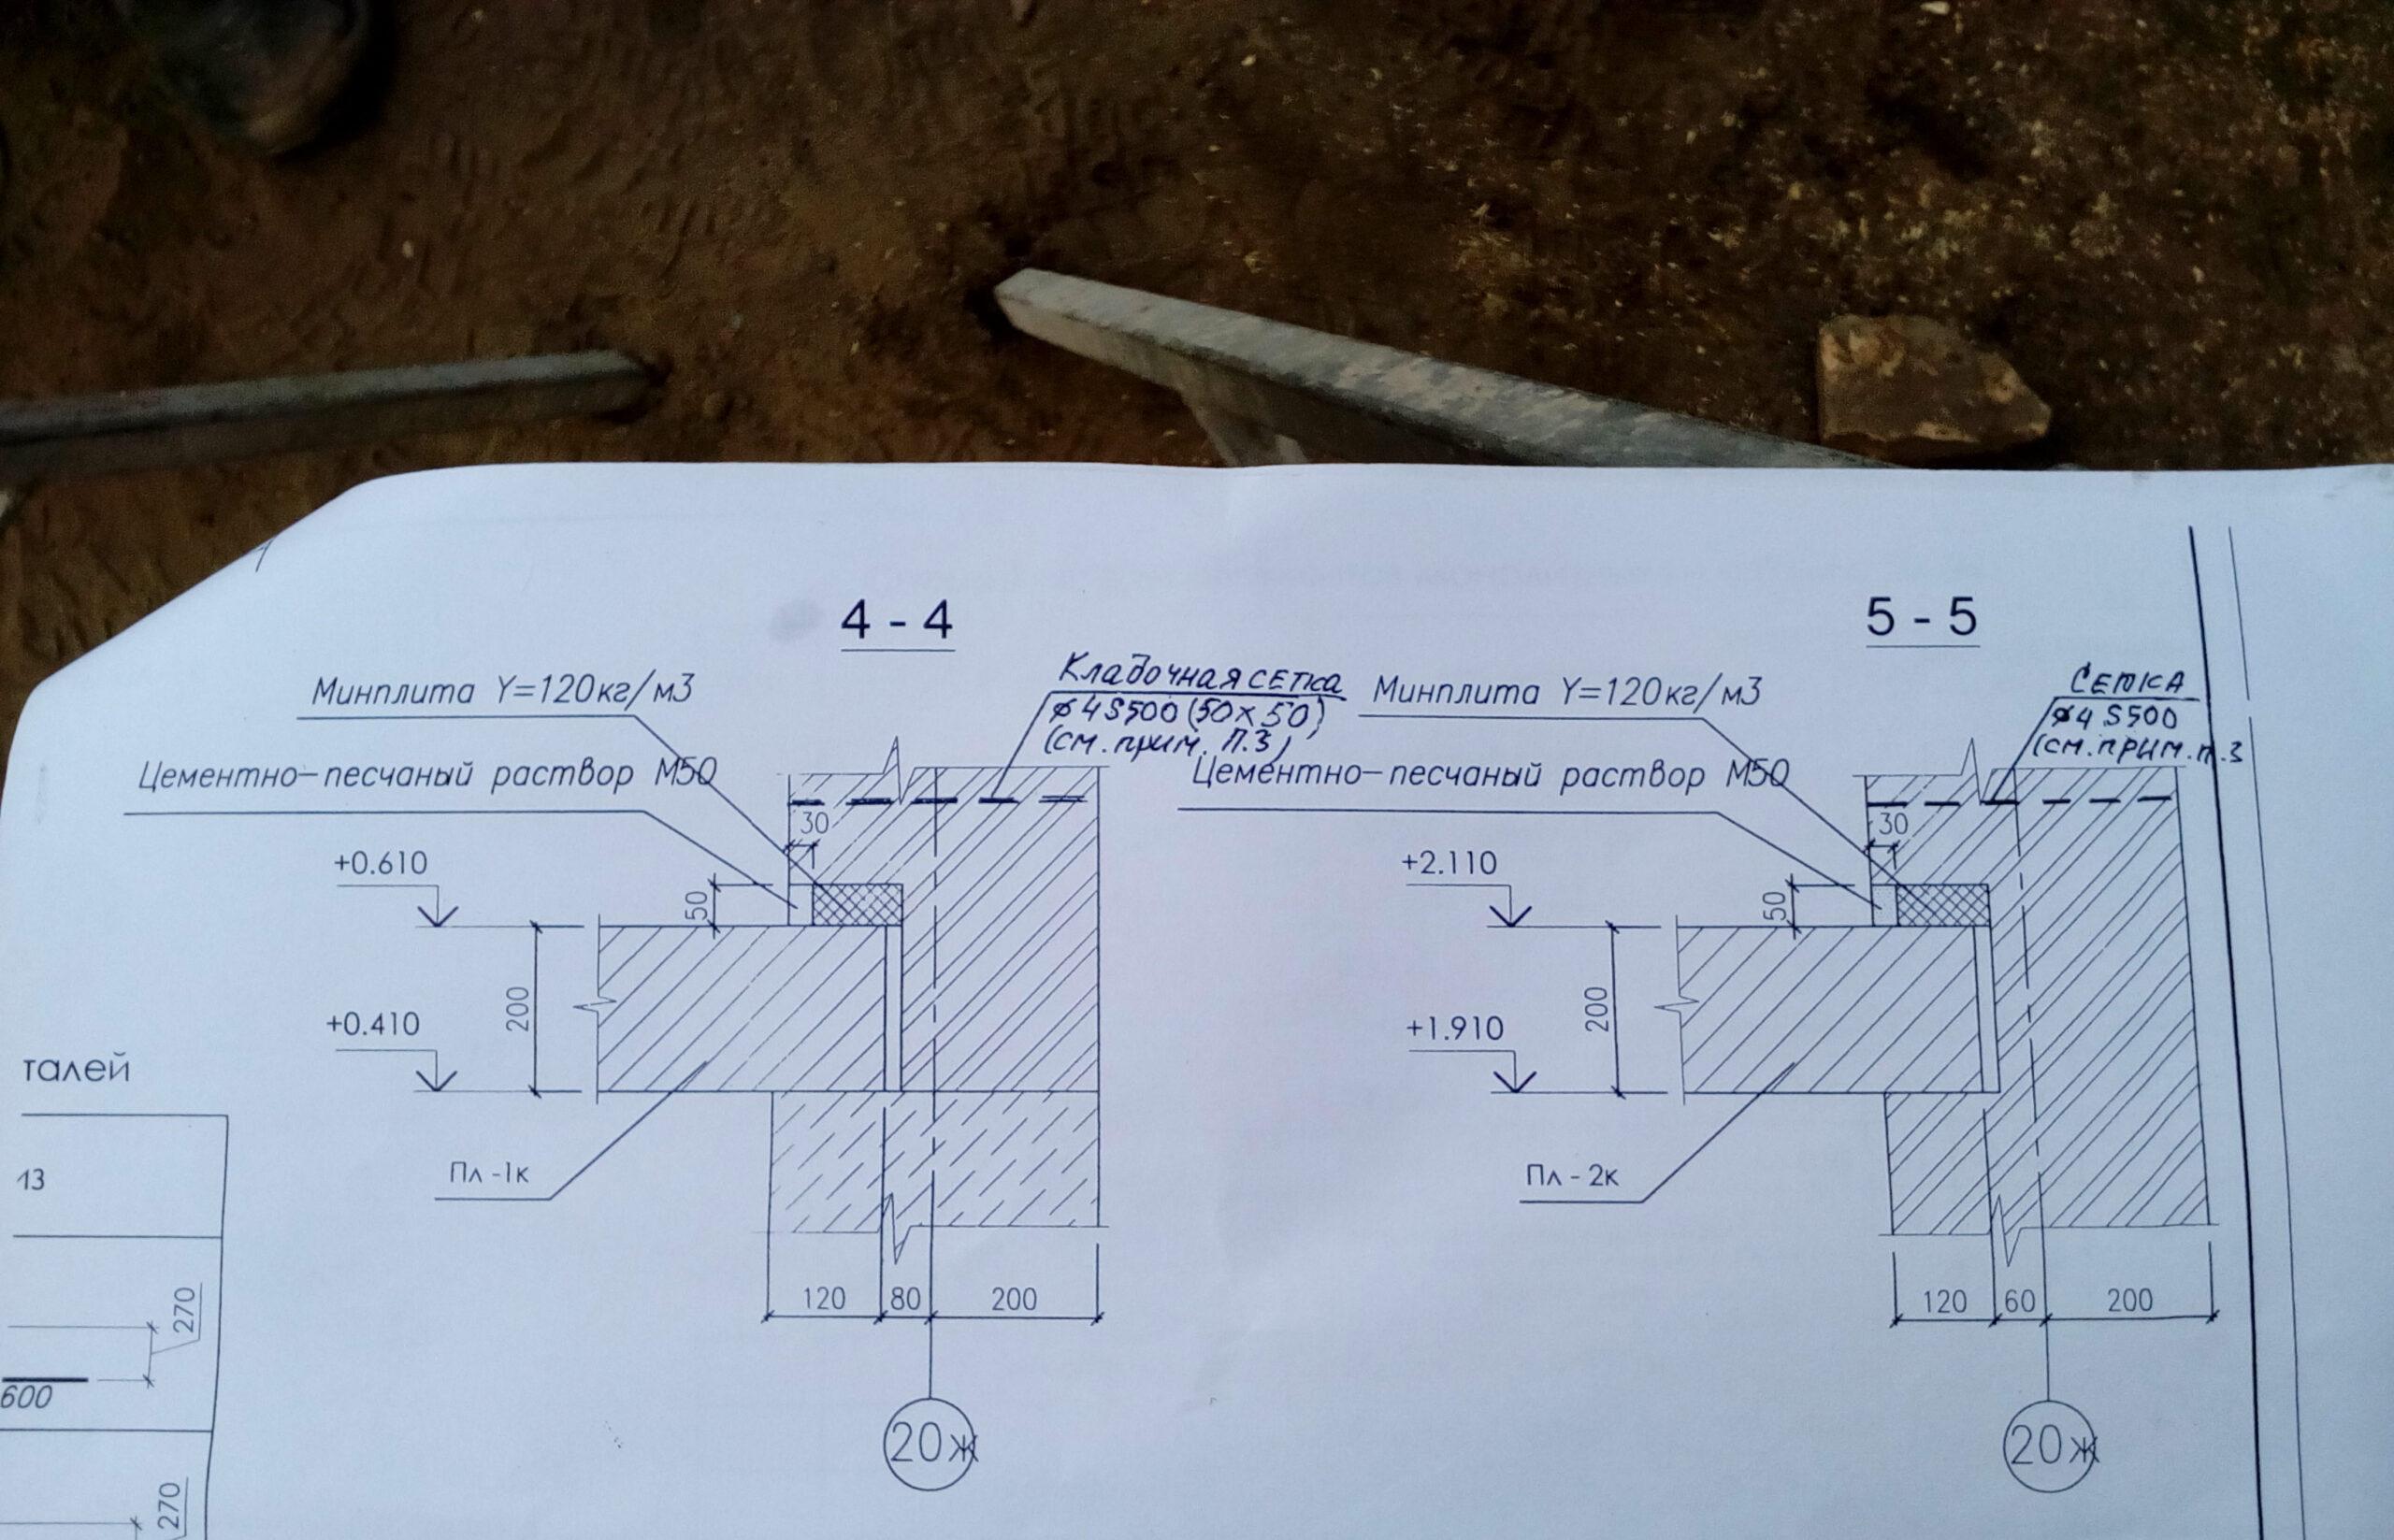 чертеж опирания лестничной площадки на кирпичную кладку